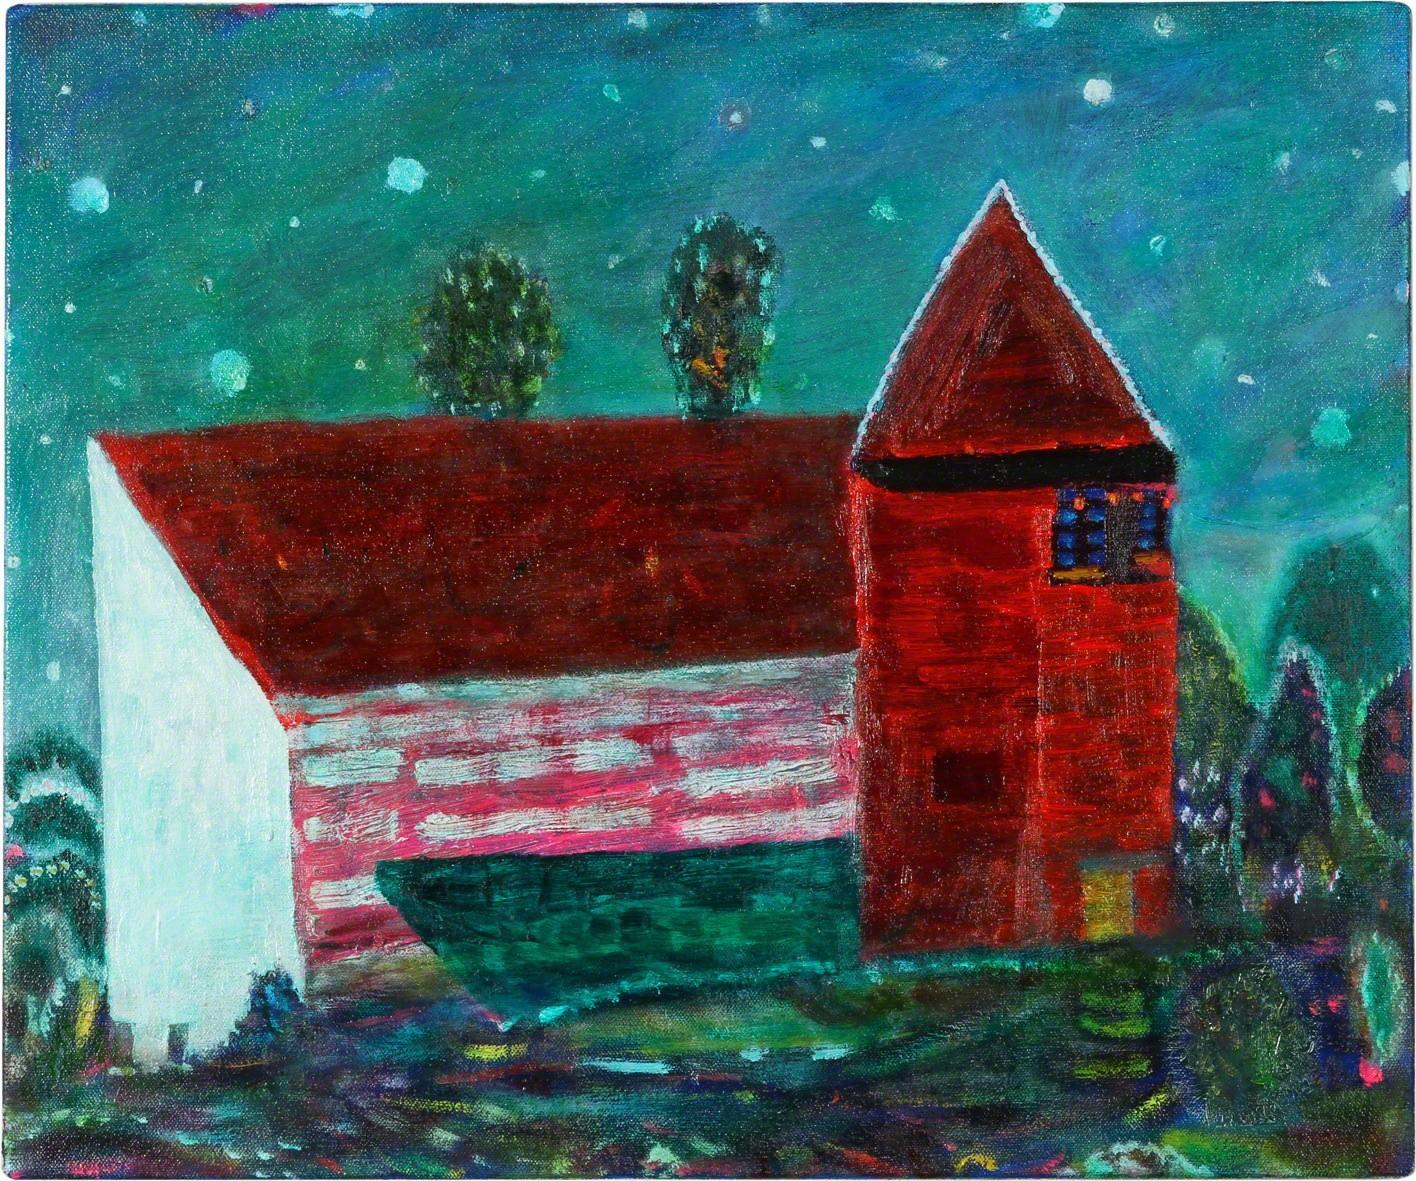 , 'red house,' 2012, Tomio Koyama Gallery